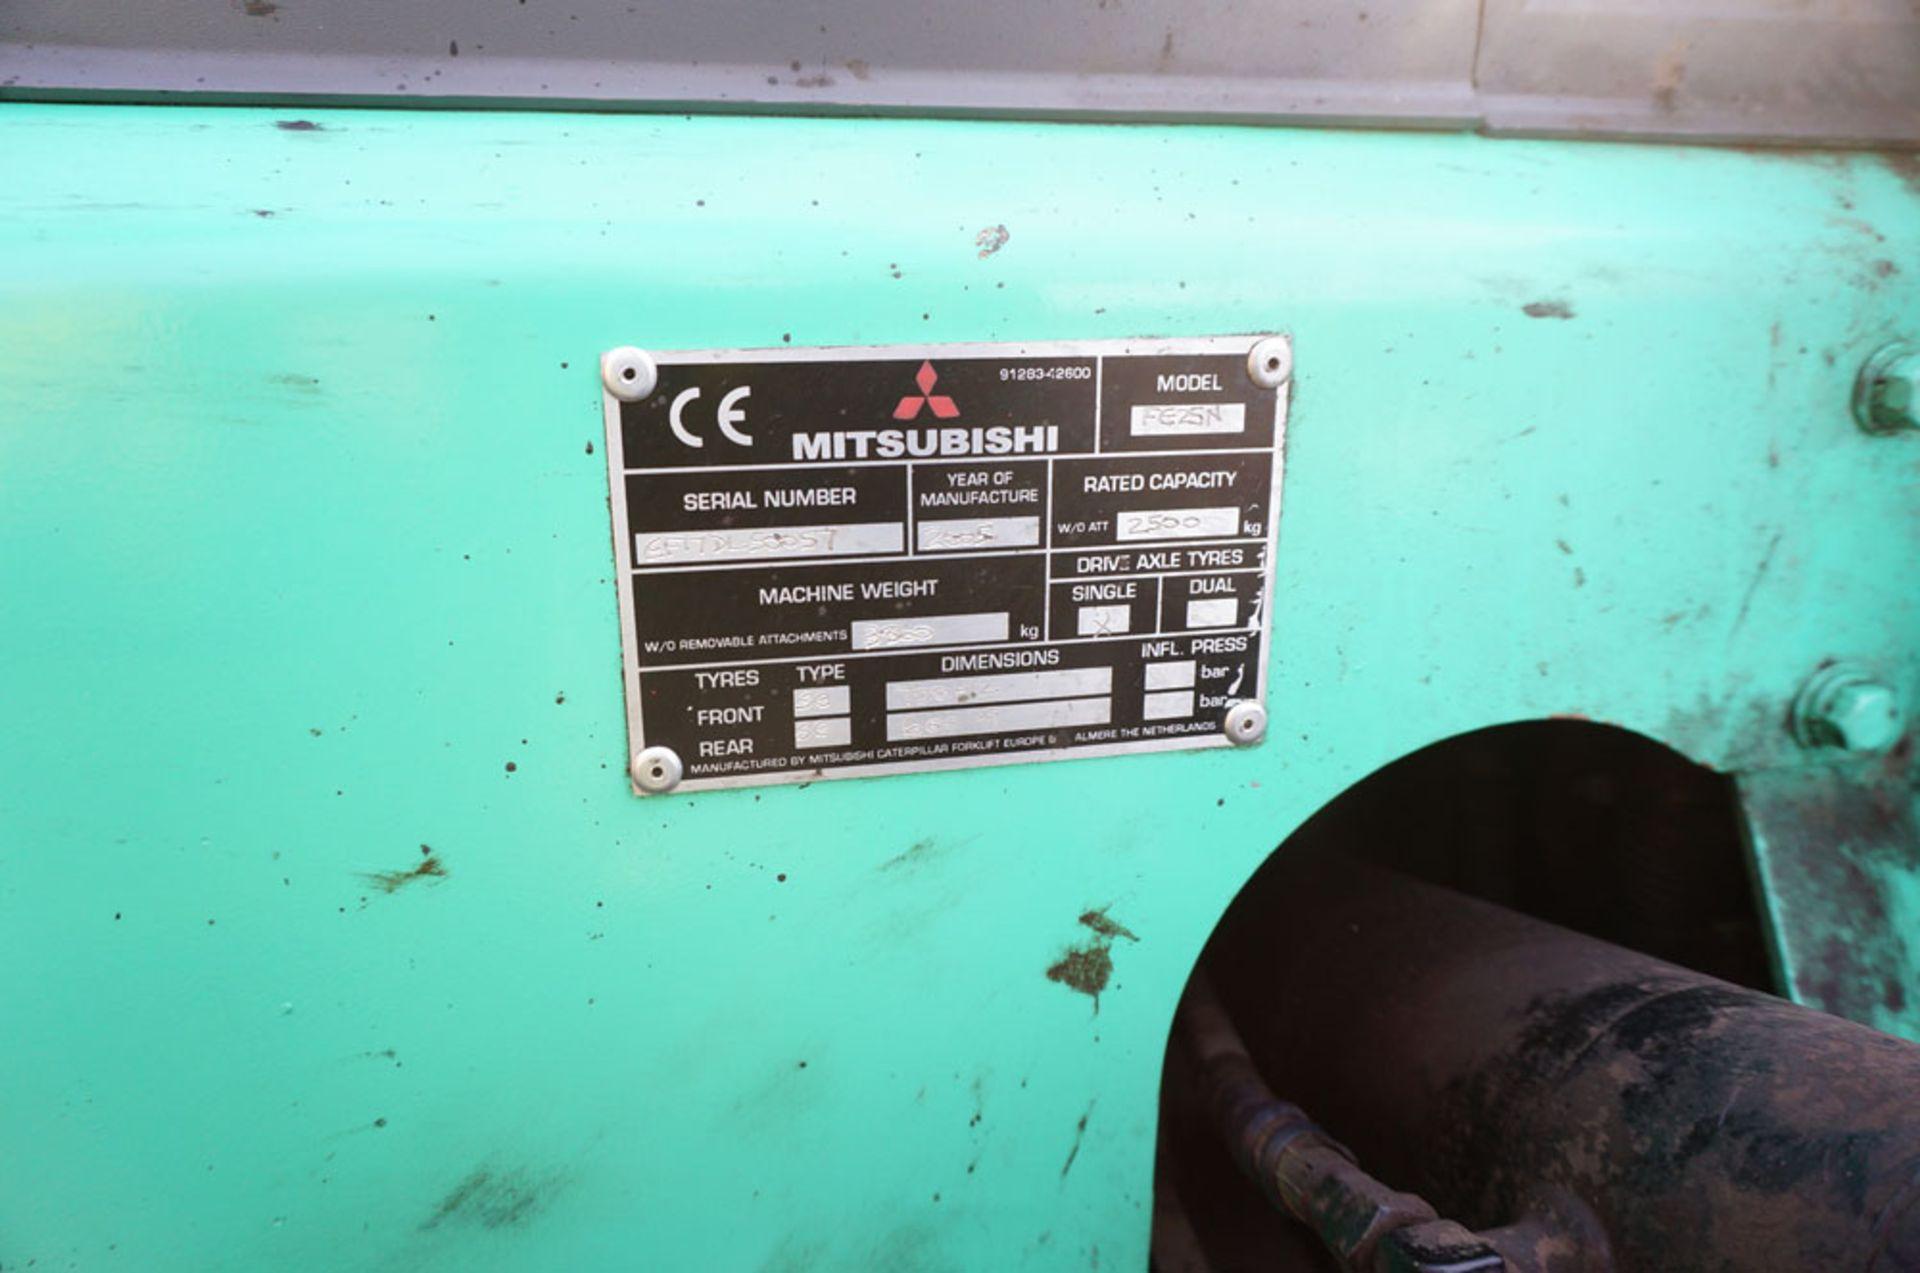 Lot 6 - MITSUBISHI Model FG25N Counterbalance Lift Fork Truck.